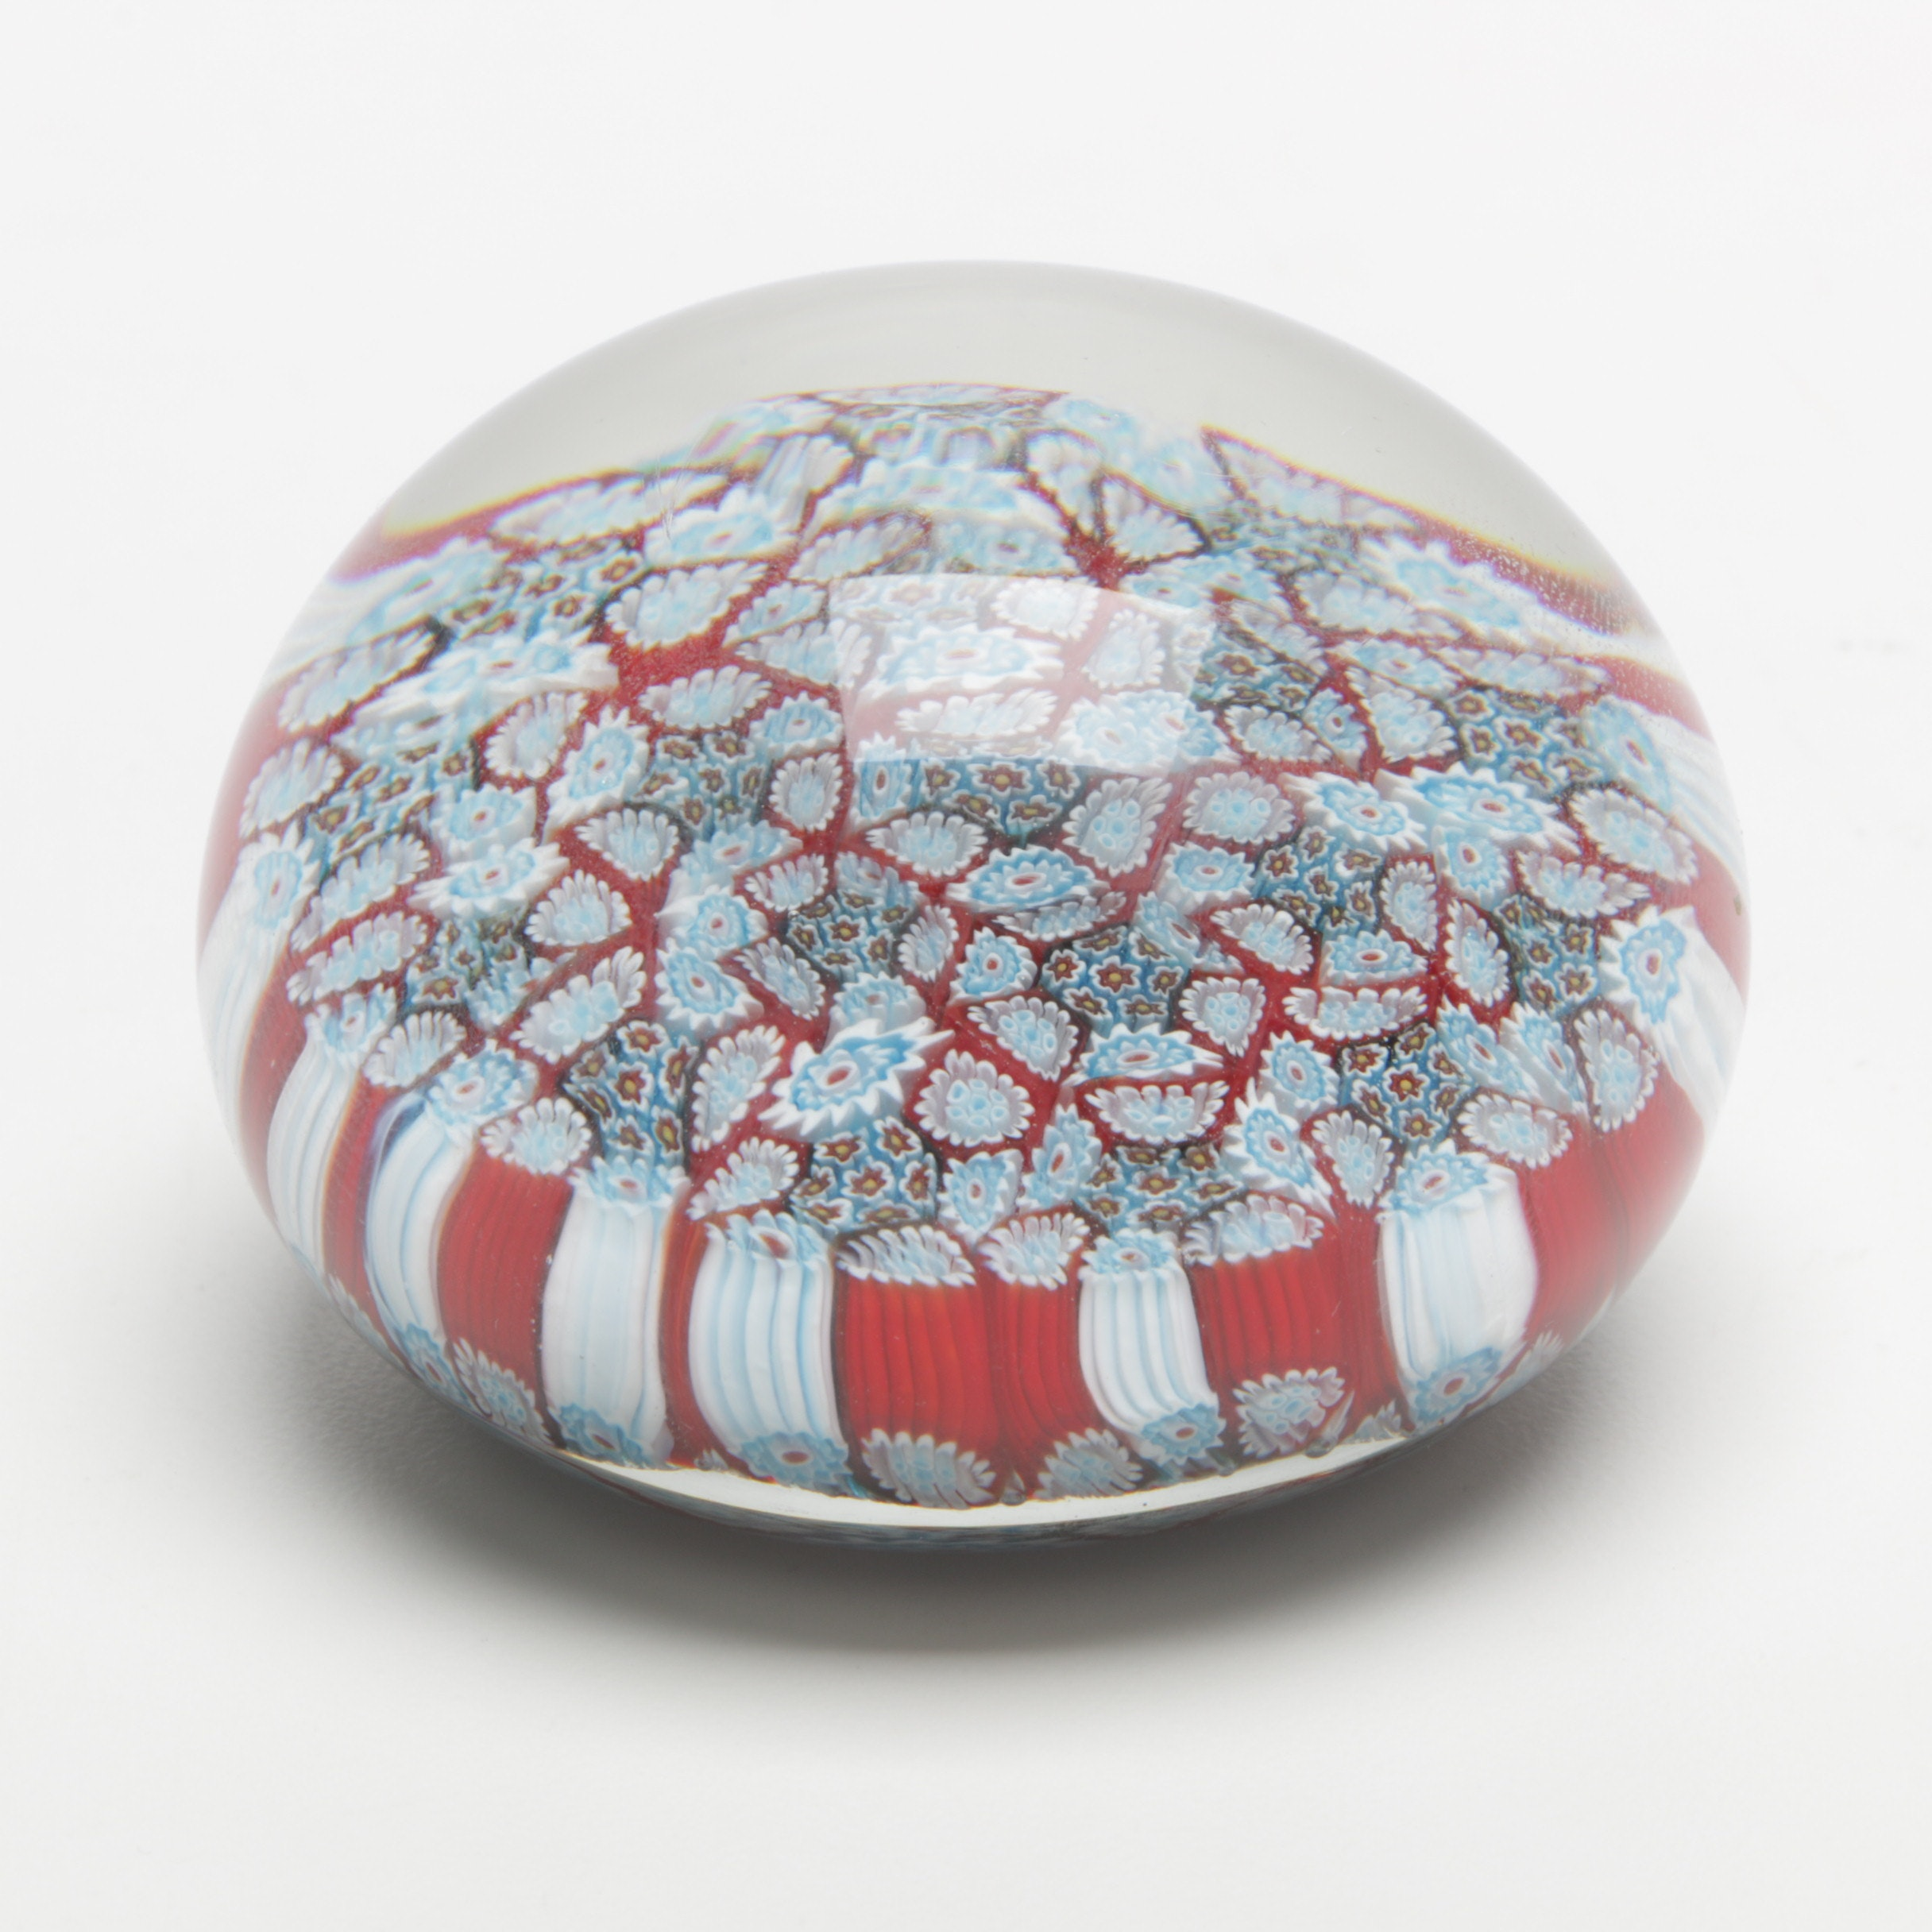 Millefori Art Glass Paperweight